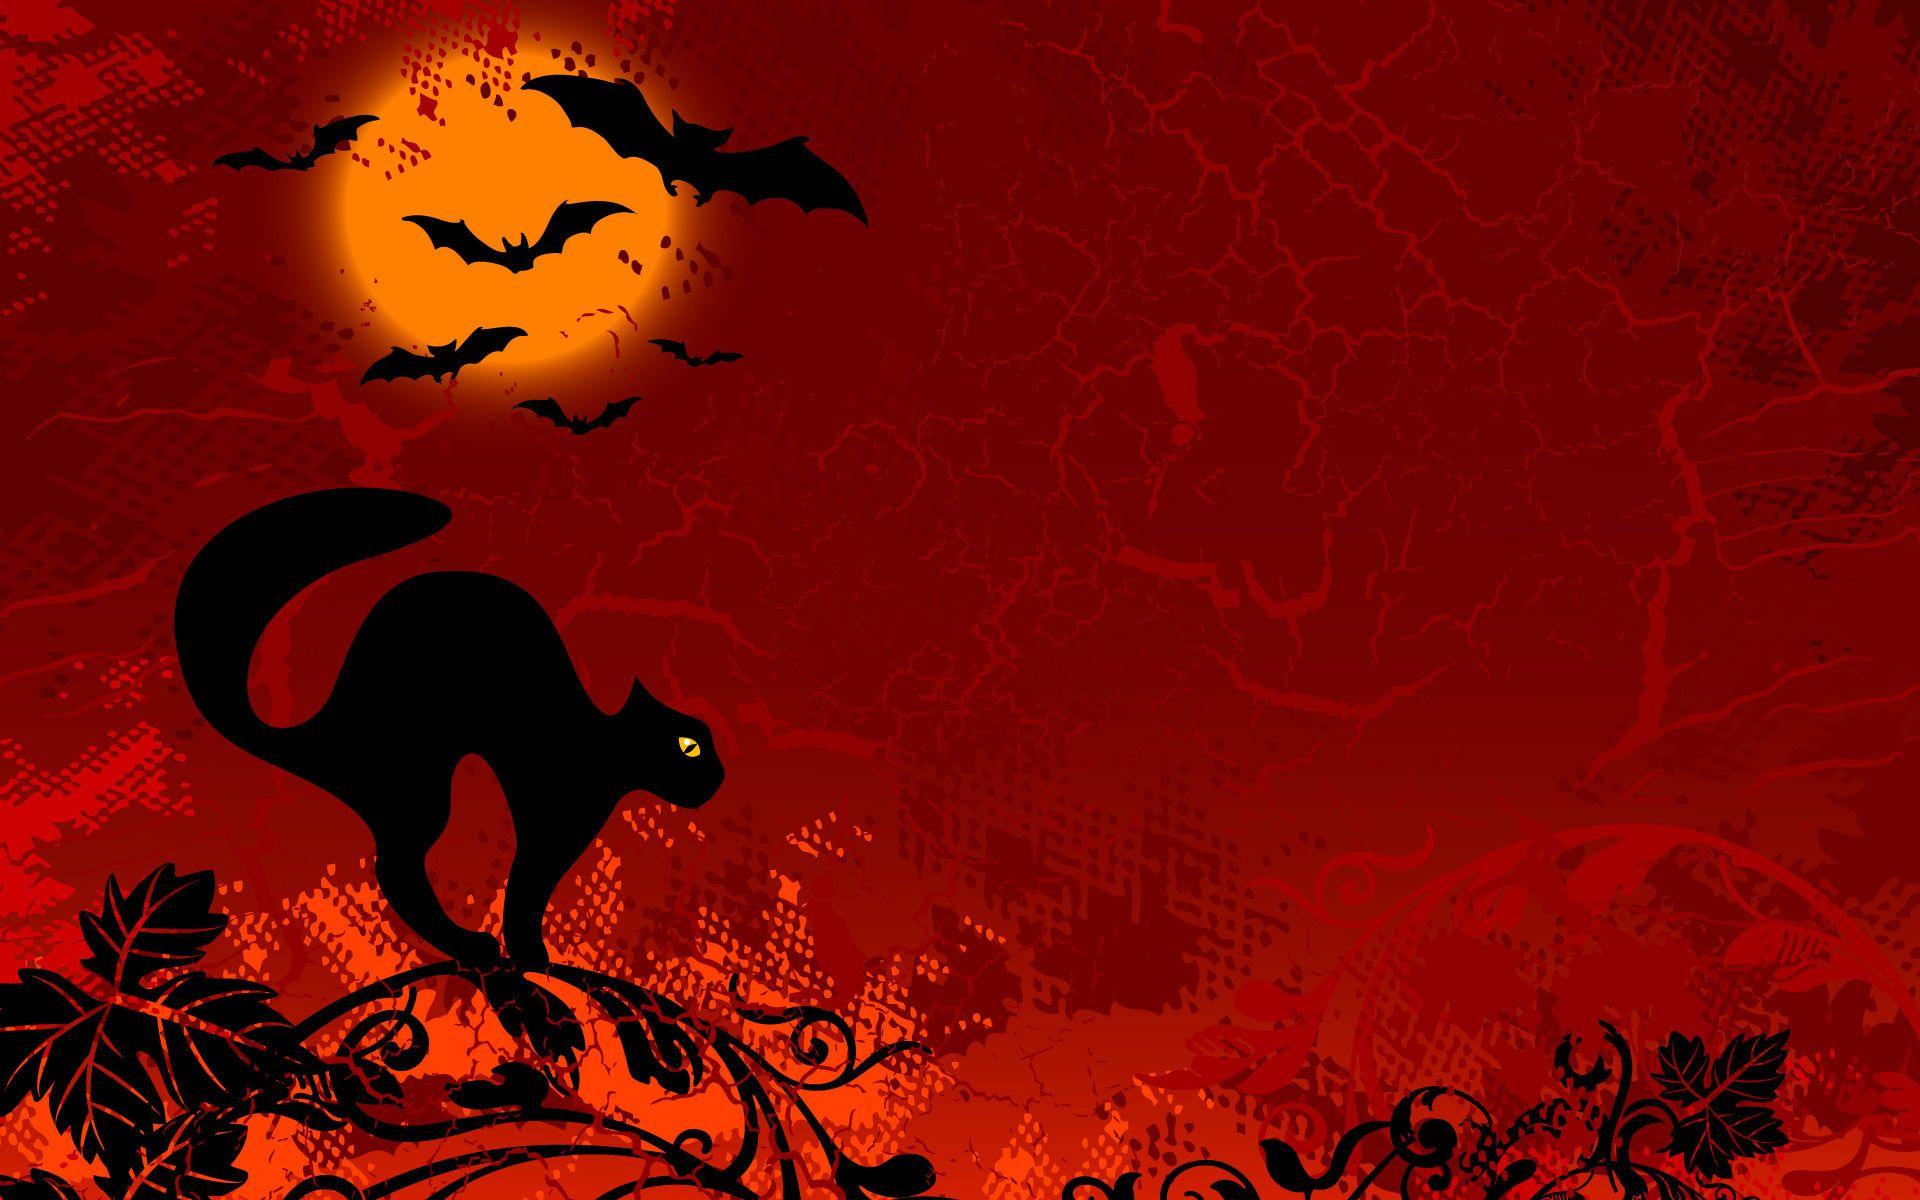 halloween wallpaper picture - Halloween Wallpapaer